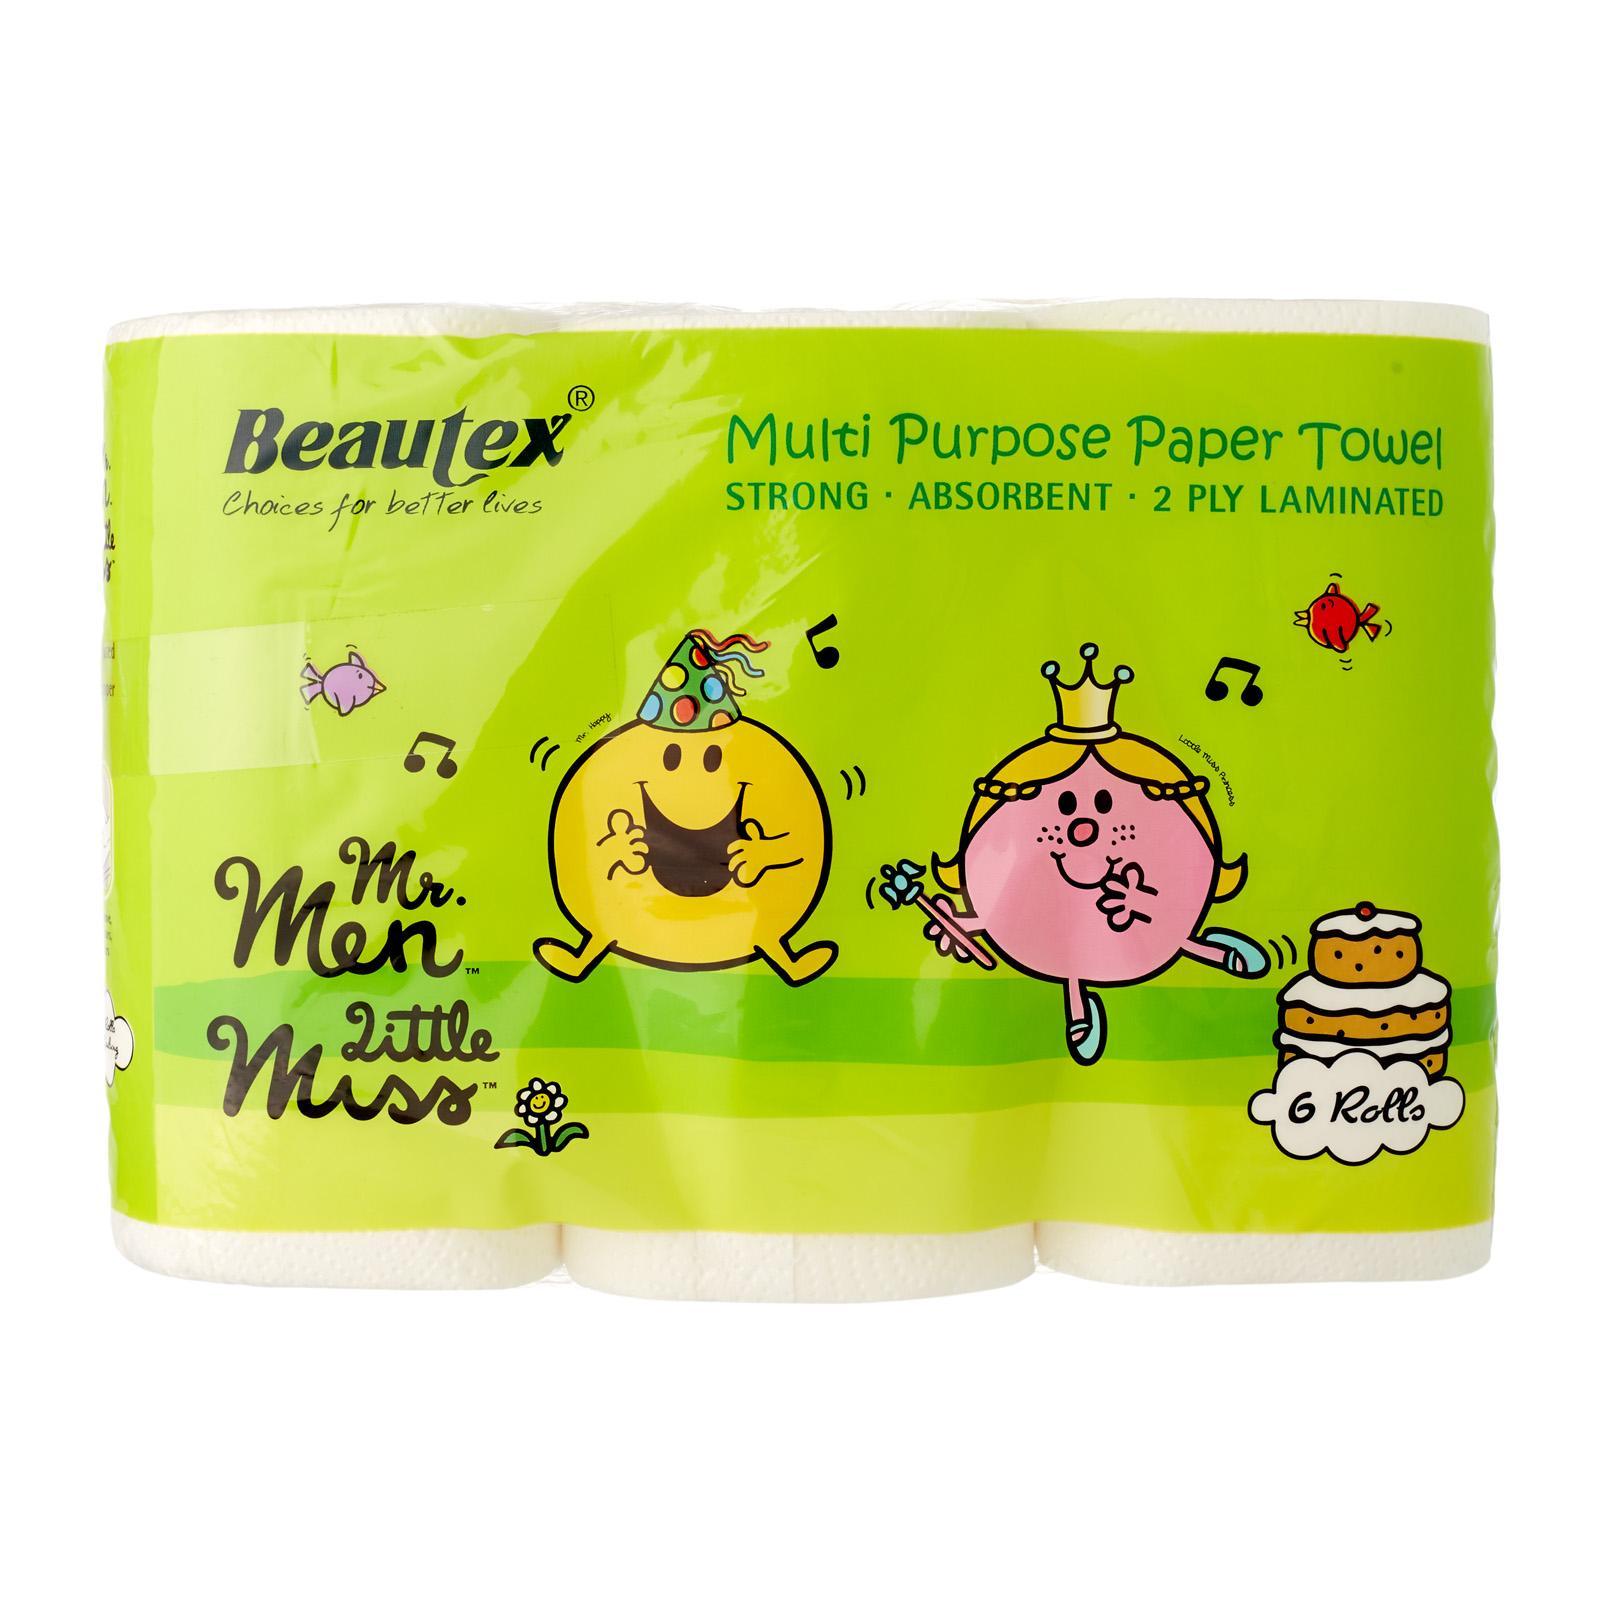 Beautex Mr Men and Little Miss Pure Pulp Kitchen Towel